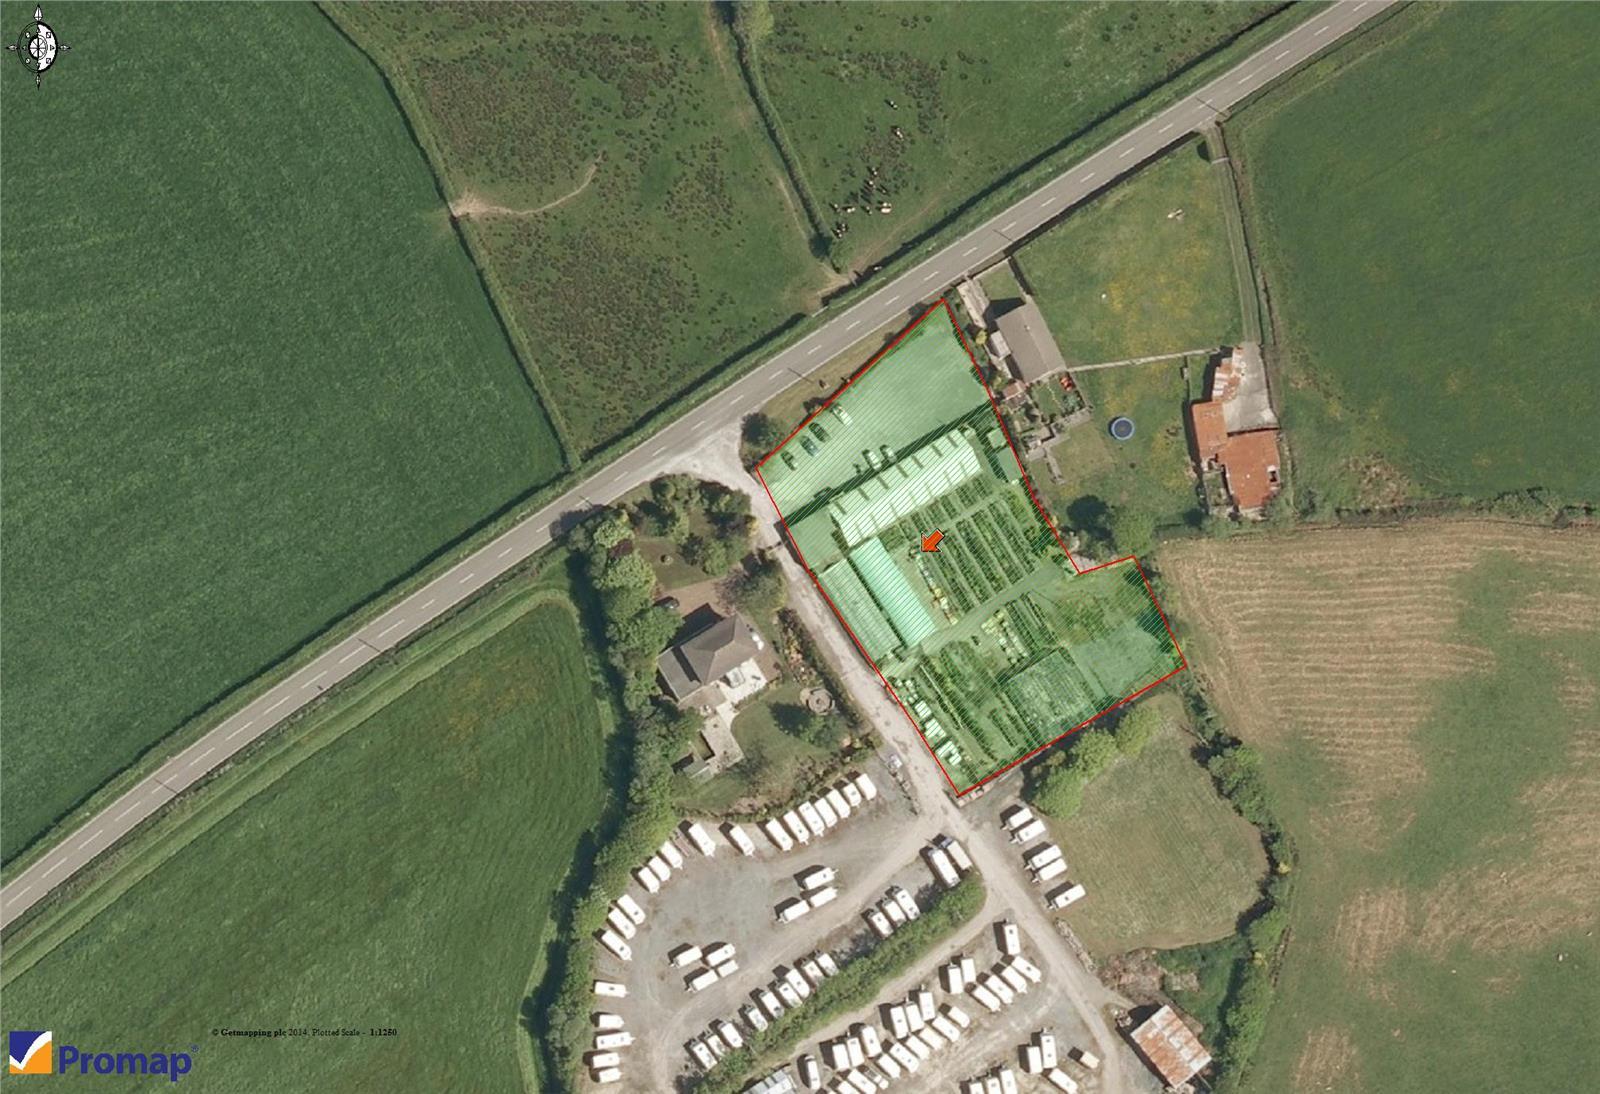 Swiss Valley Garden Centre, Felinfoel Road, Llanelli, Dyfed, SA14